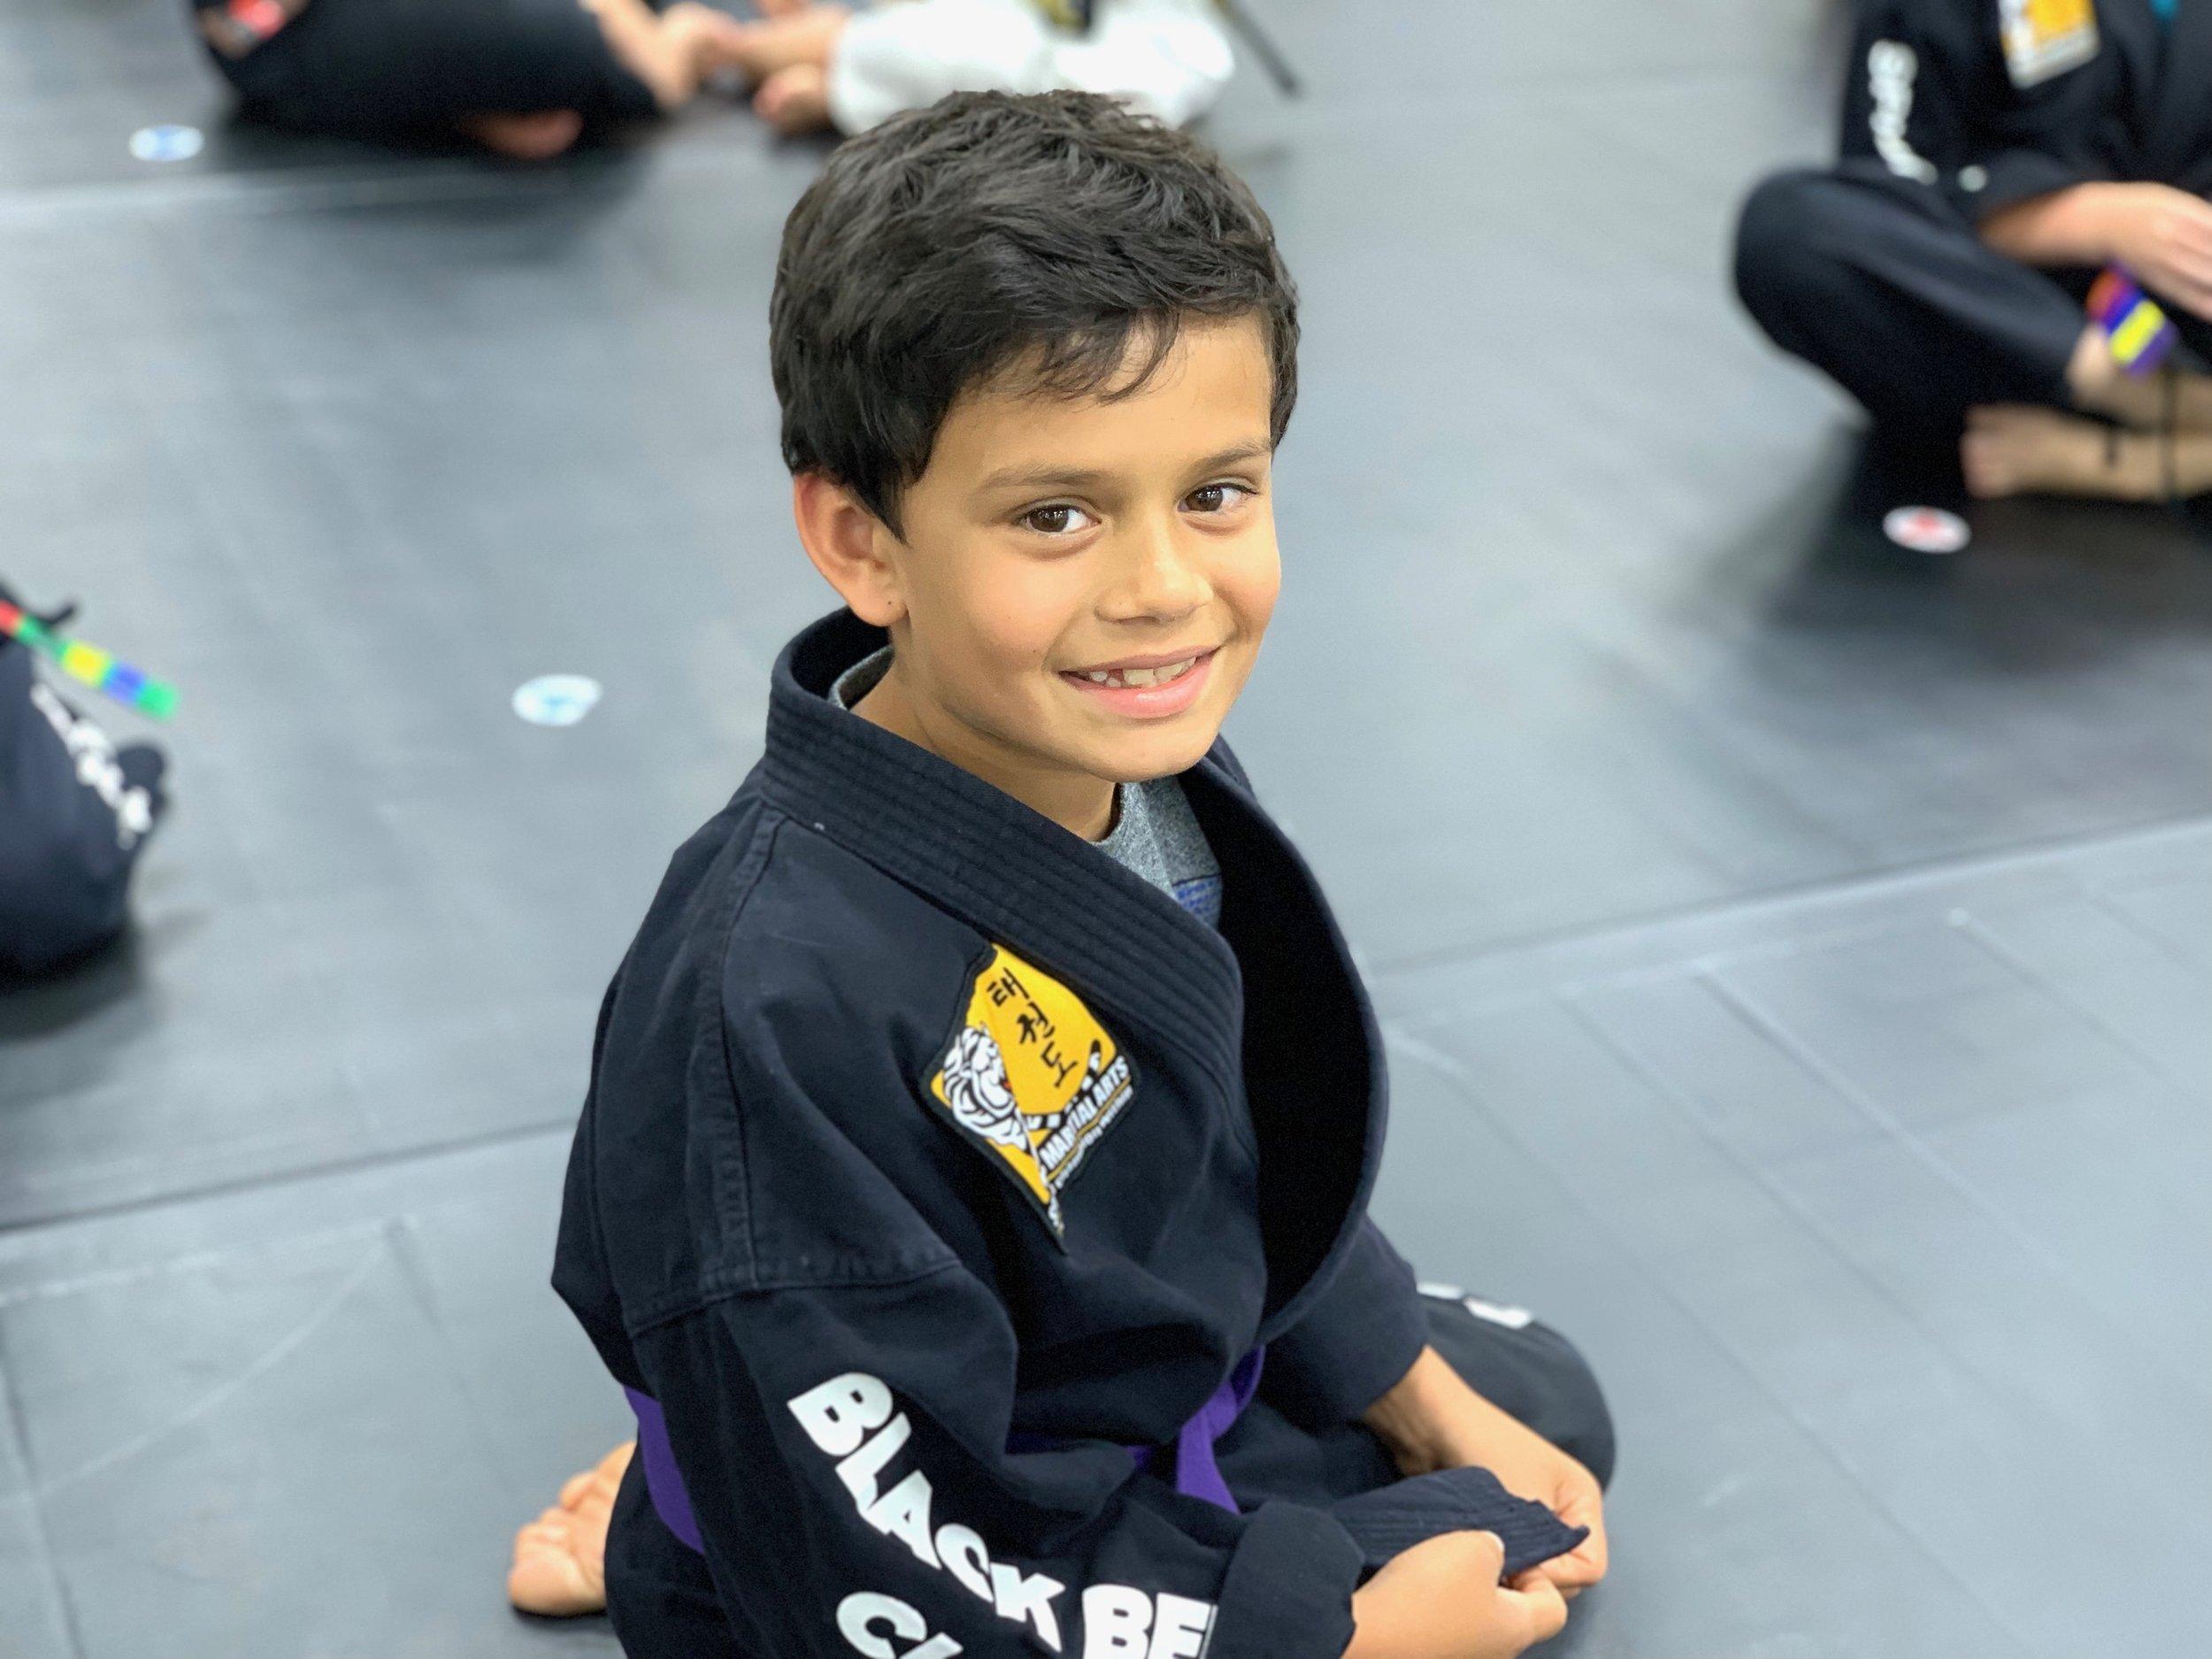 karate-kids-program-souhtlake-keller-grapevine-texas00034.jpeg